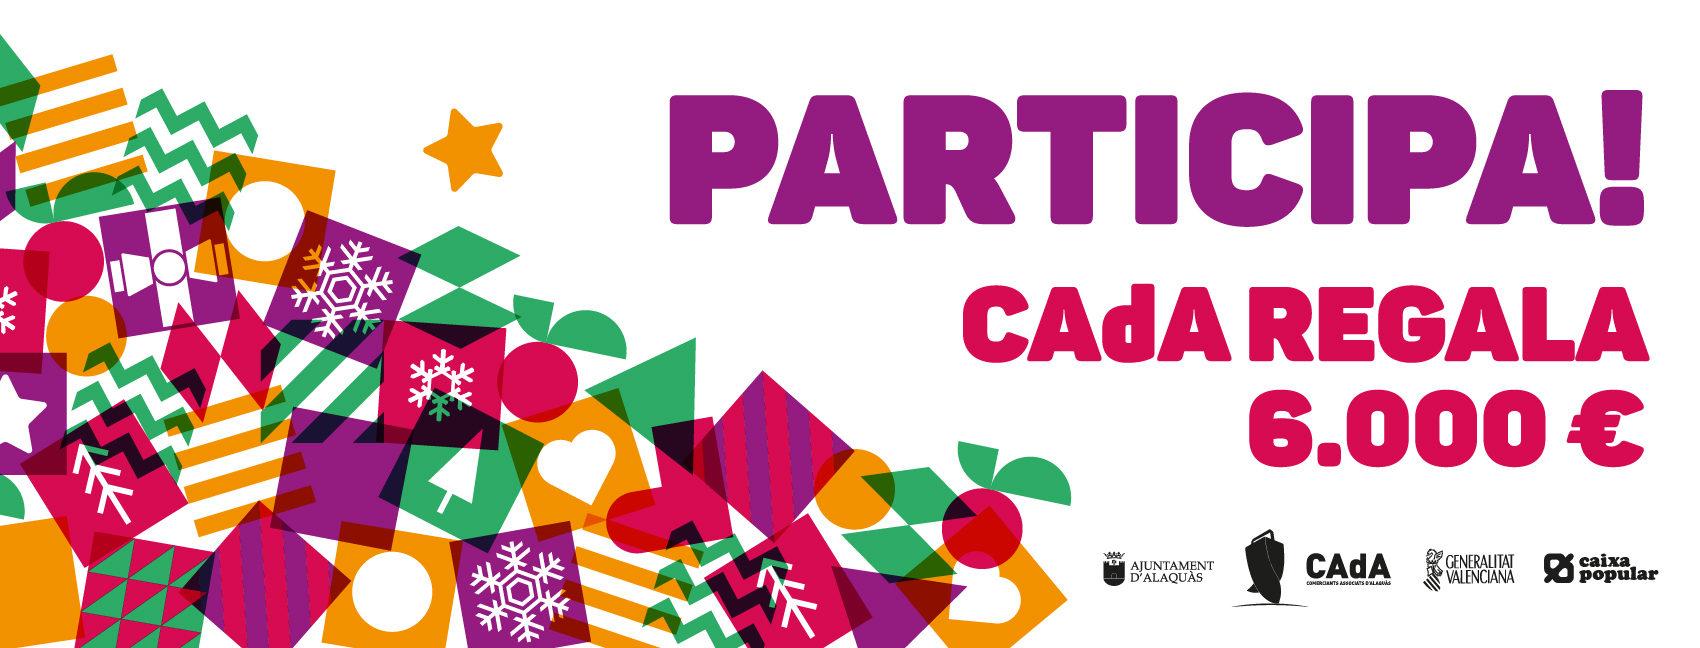 CAdA-navidad-2017-2018-regalo-sorteo-6000-euros-comercio-comerciantes-compra-navideña